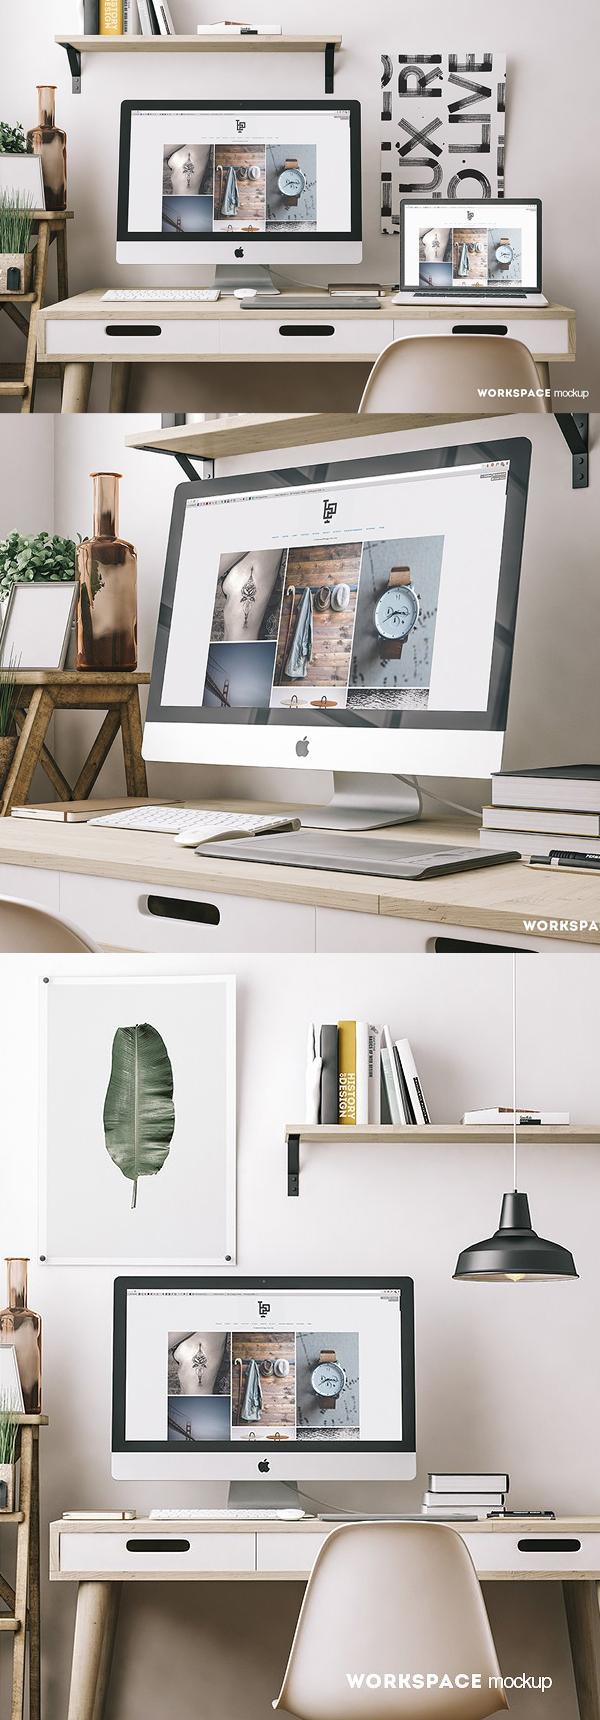 Workspace Mockup Set